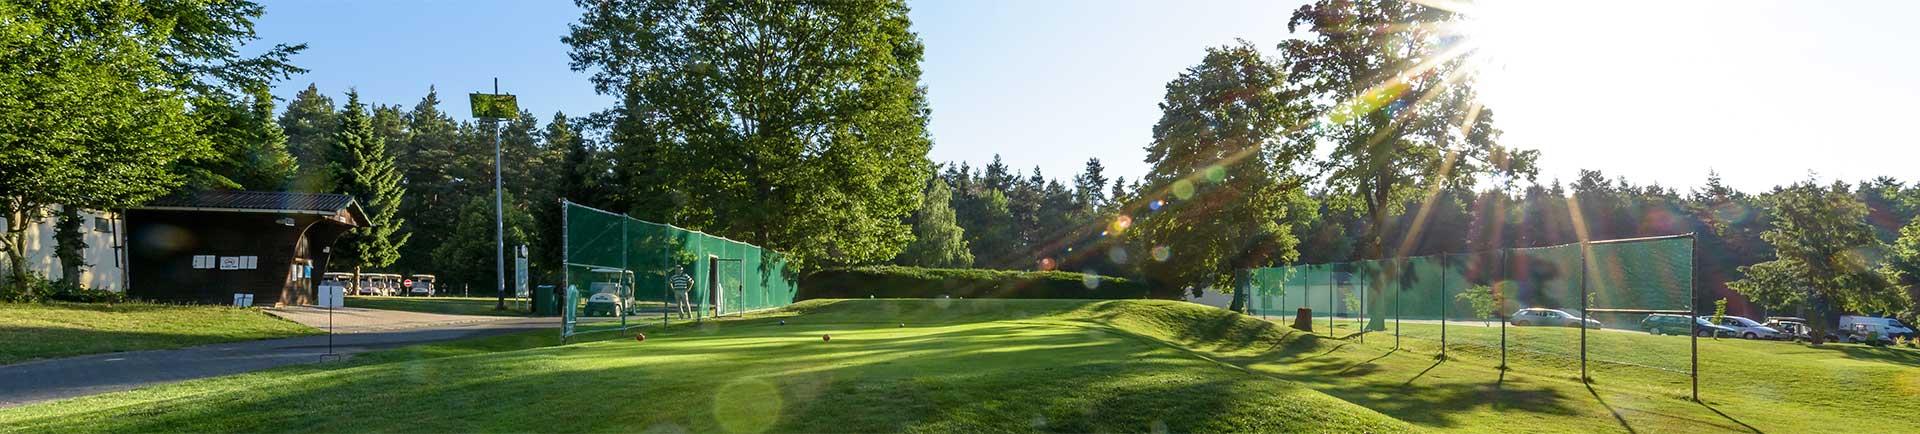 rheinblick-golfcourse-30